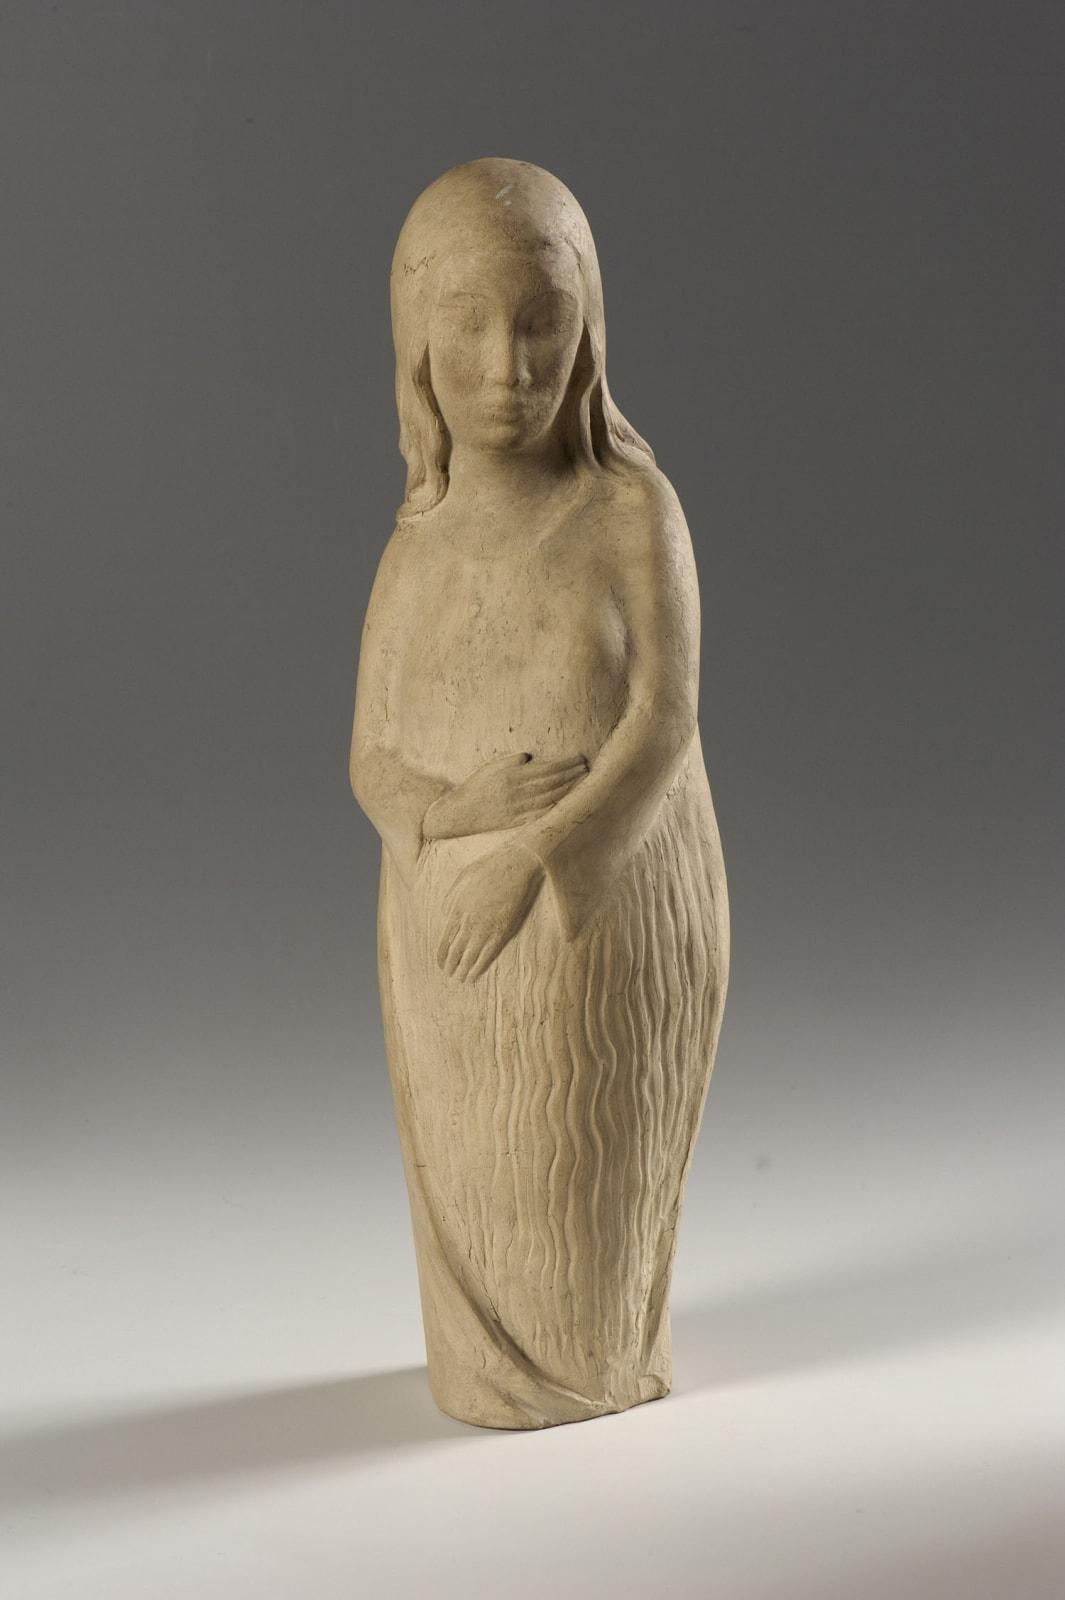 Erna Nonnenmacher (1889-1980) Maternity n.d. Plaster 41 x 13 x 8.5 cm Ben Uri Collection © Erna Nonnenmacher estate